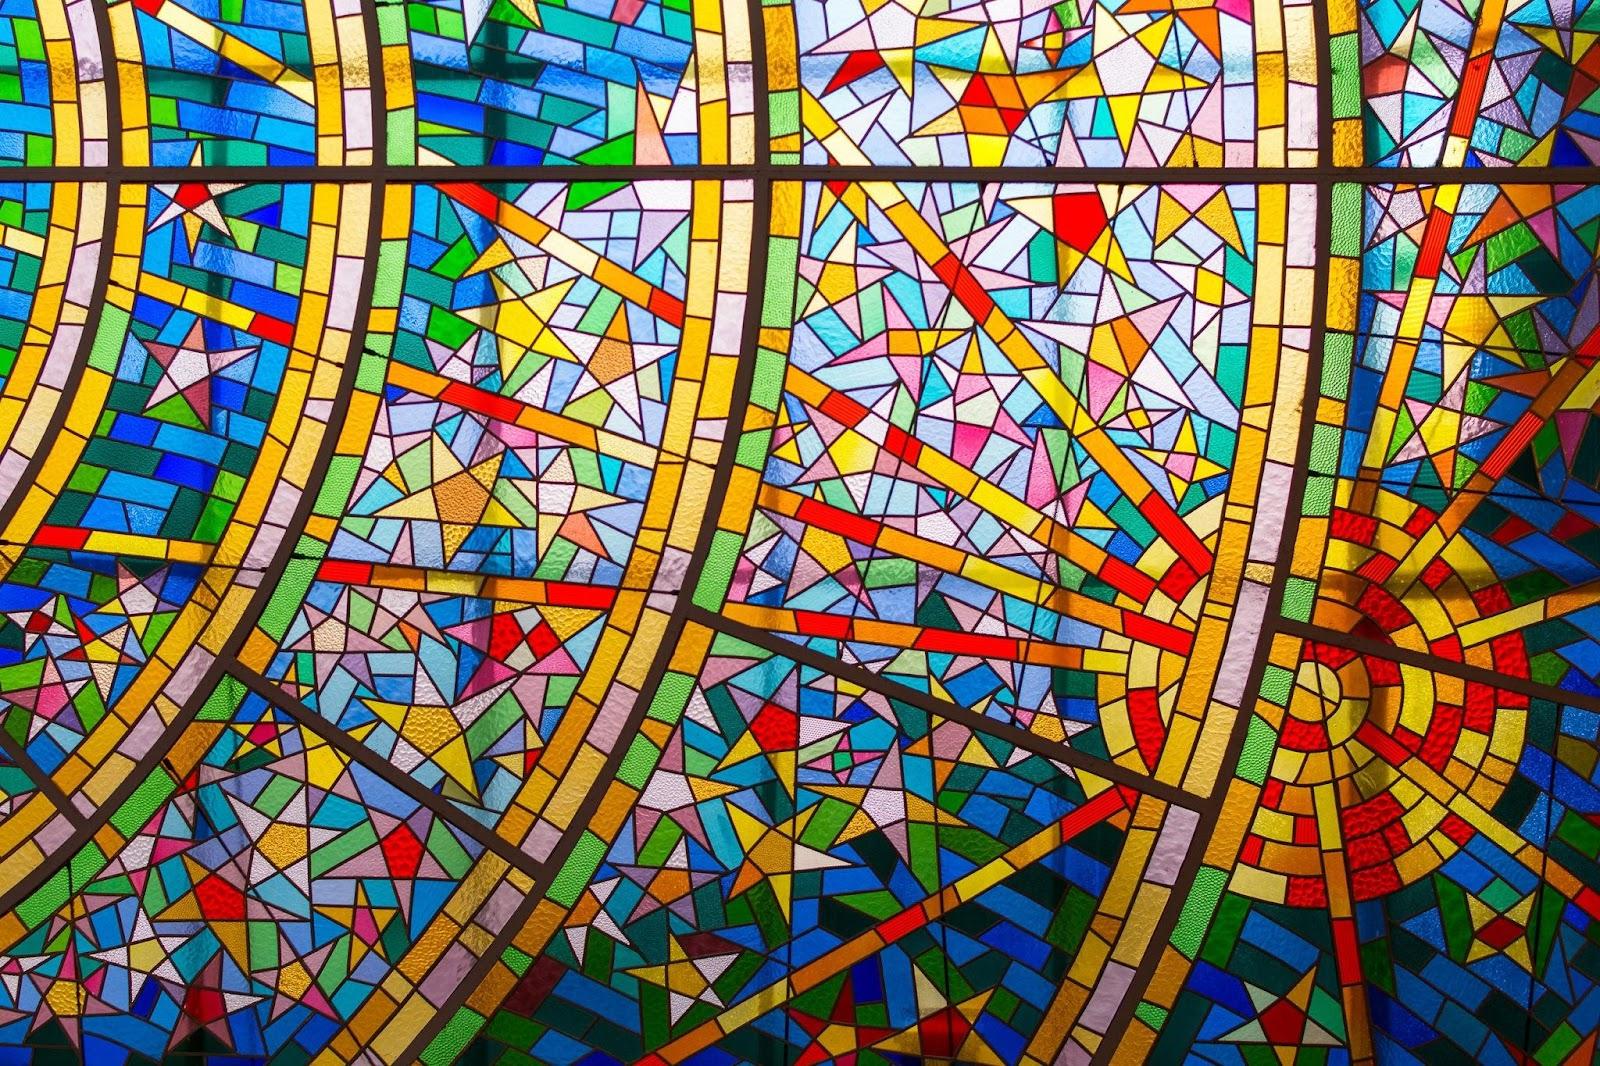 Colorful-Mosaic-Background.jpg